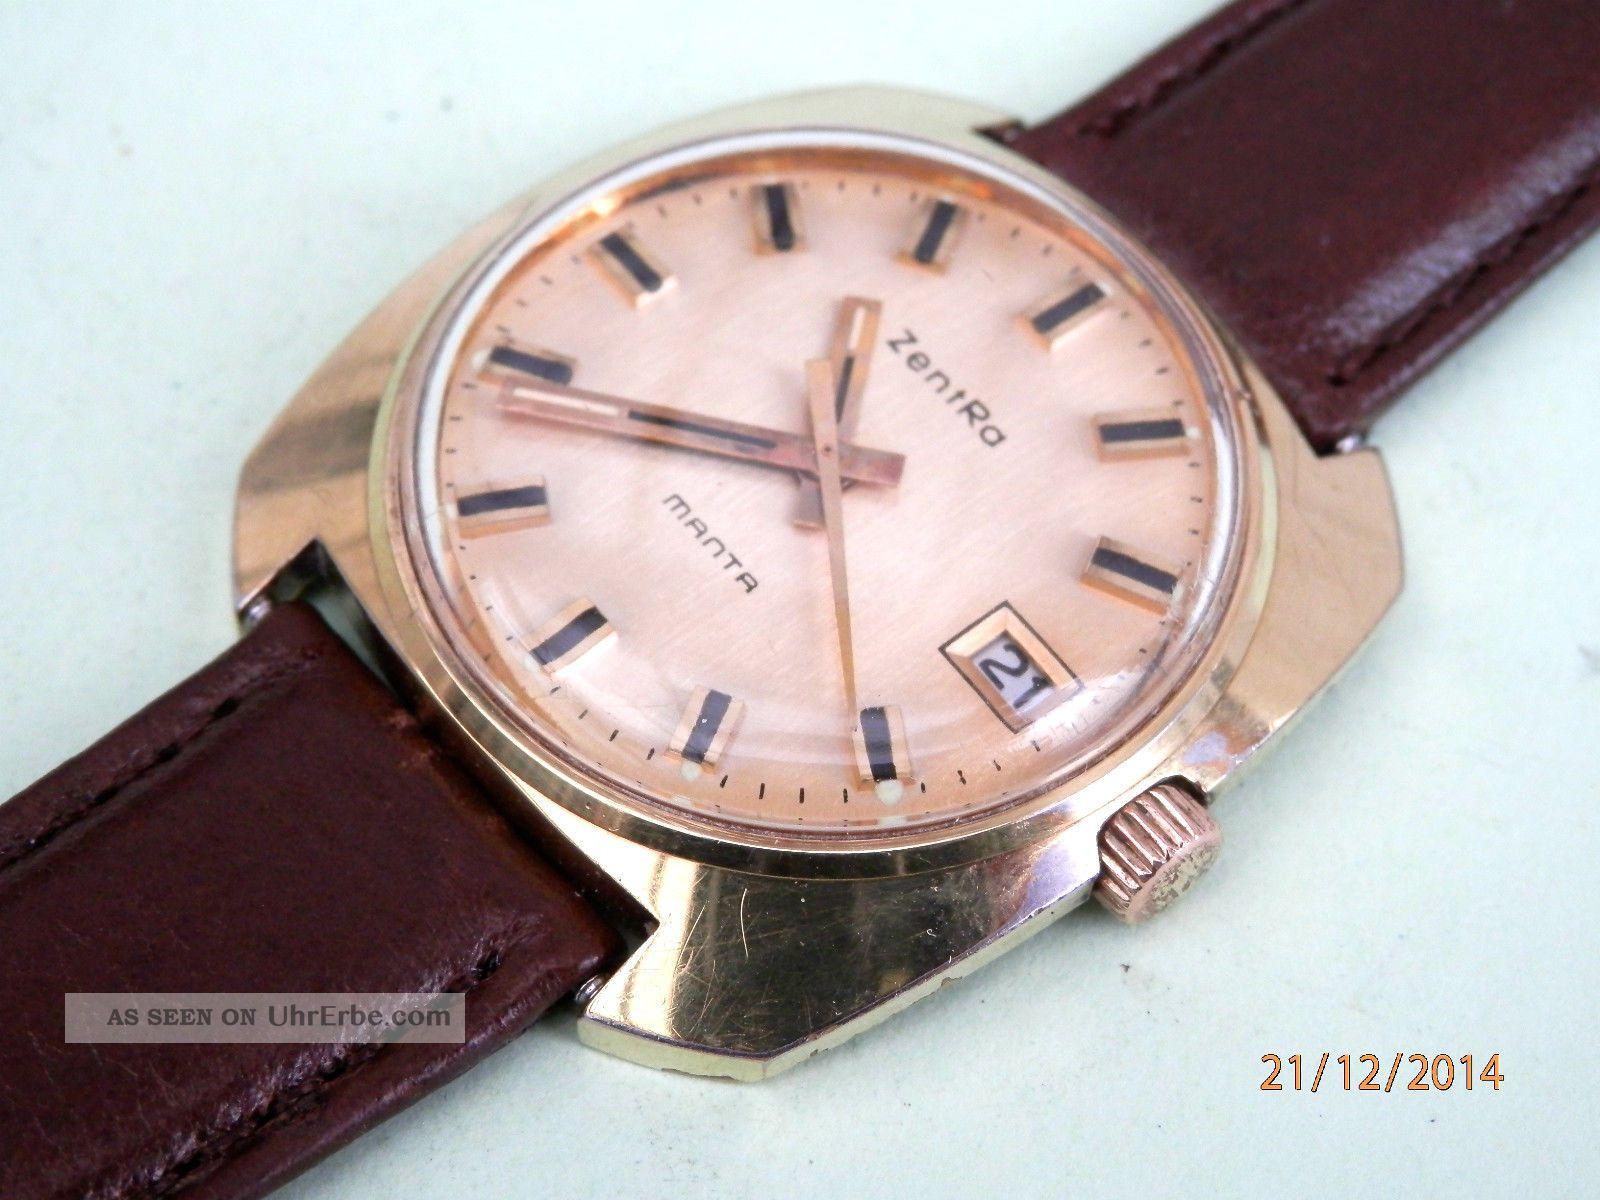 Zentra Herrenarmbanduhr 60er Jahre Modell Manta °°° Kultuhr °°° Armbanduhren Bild